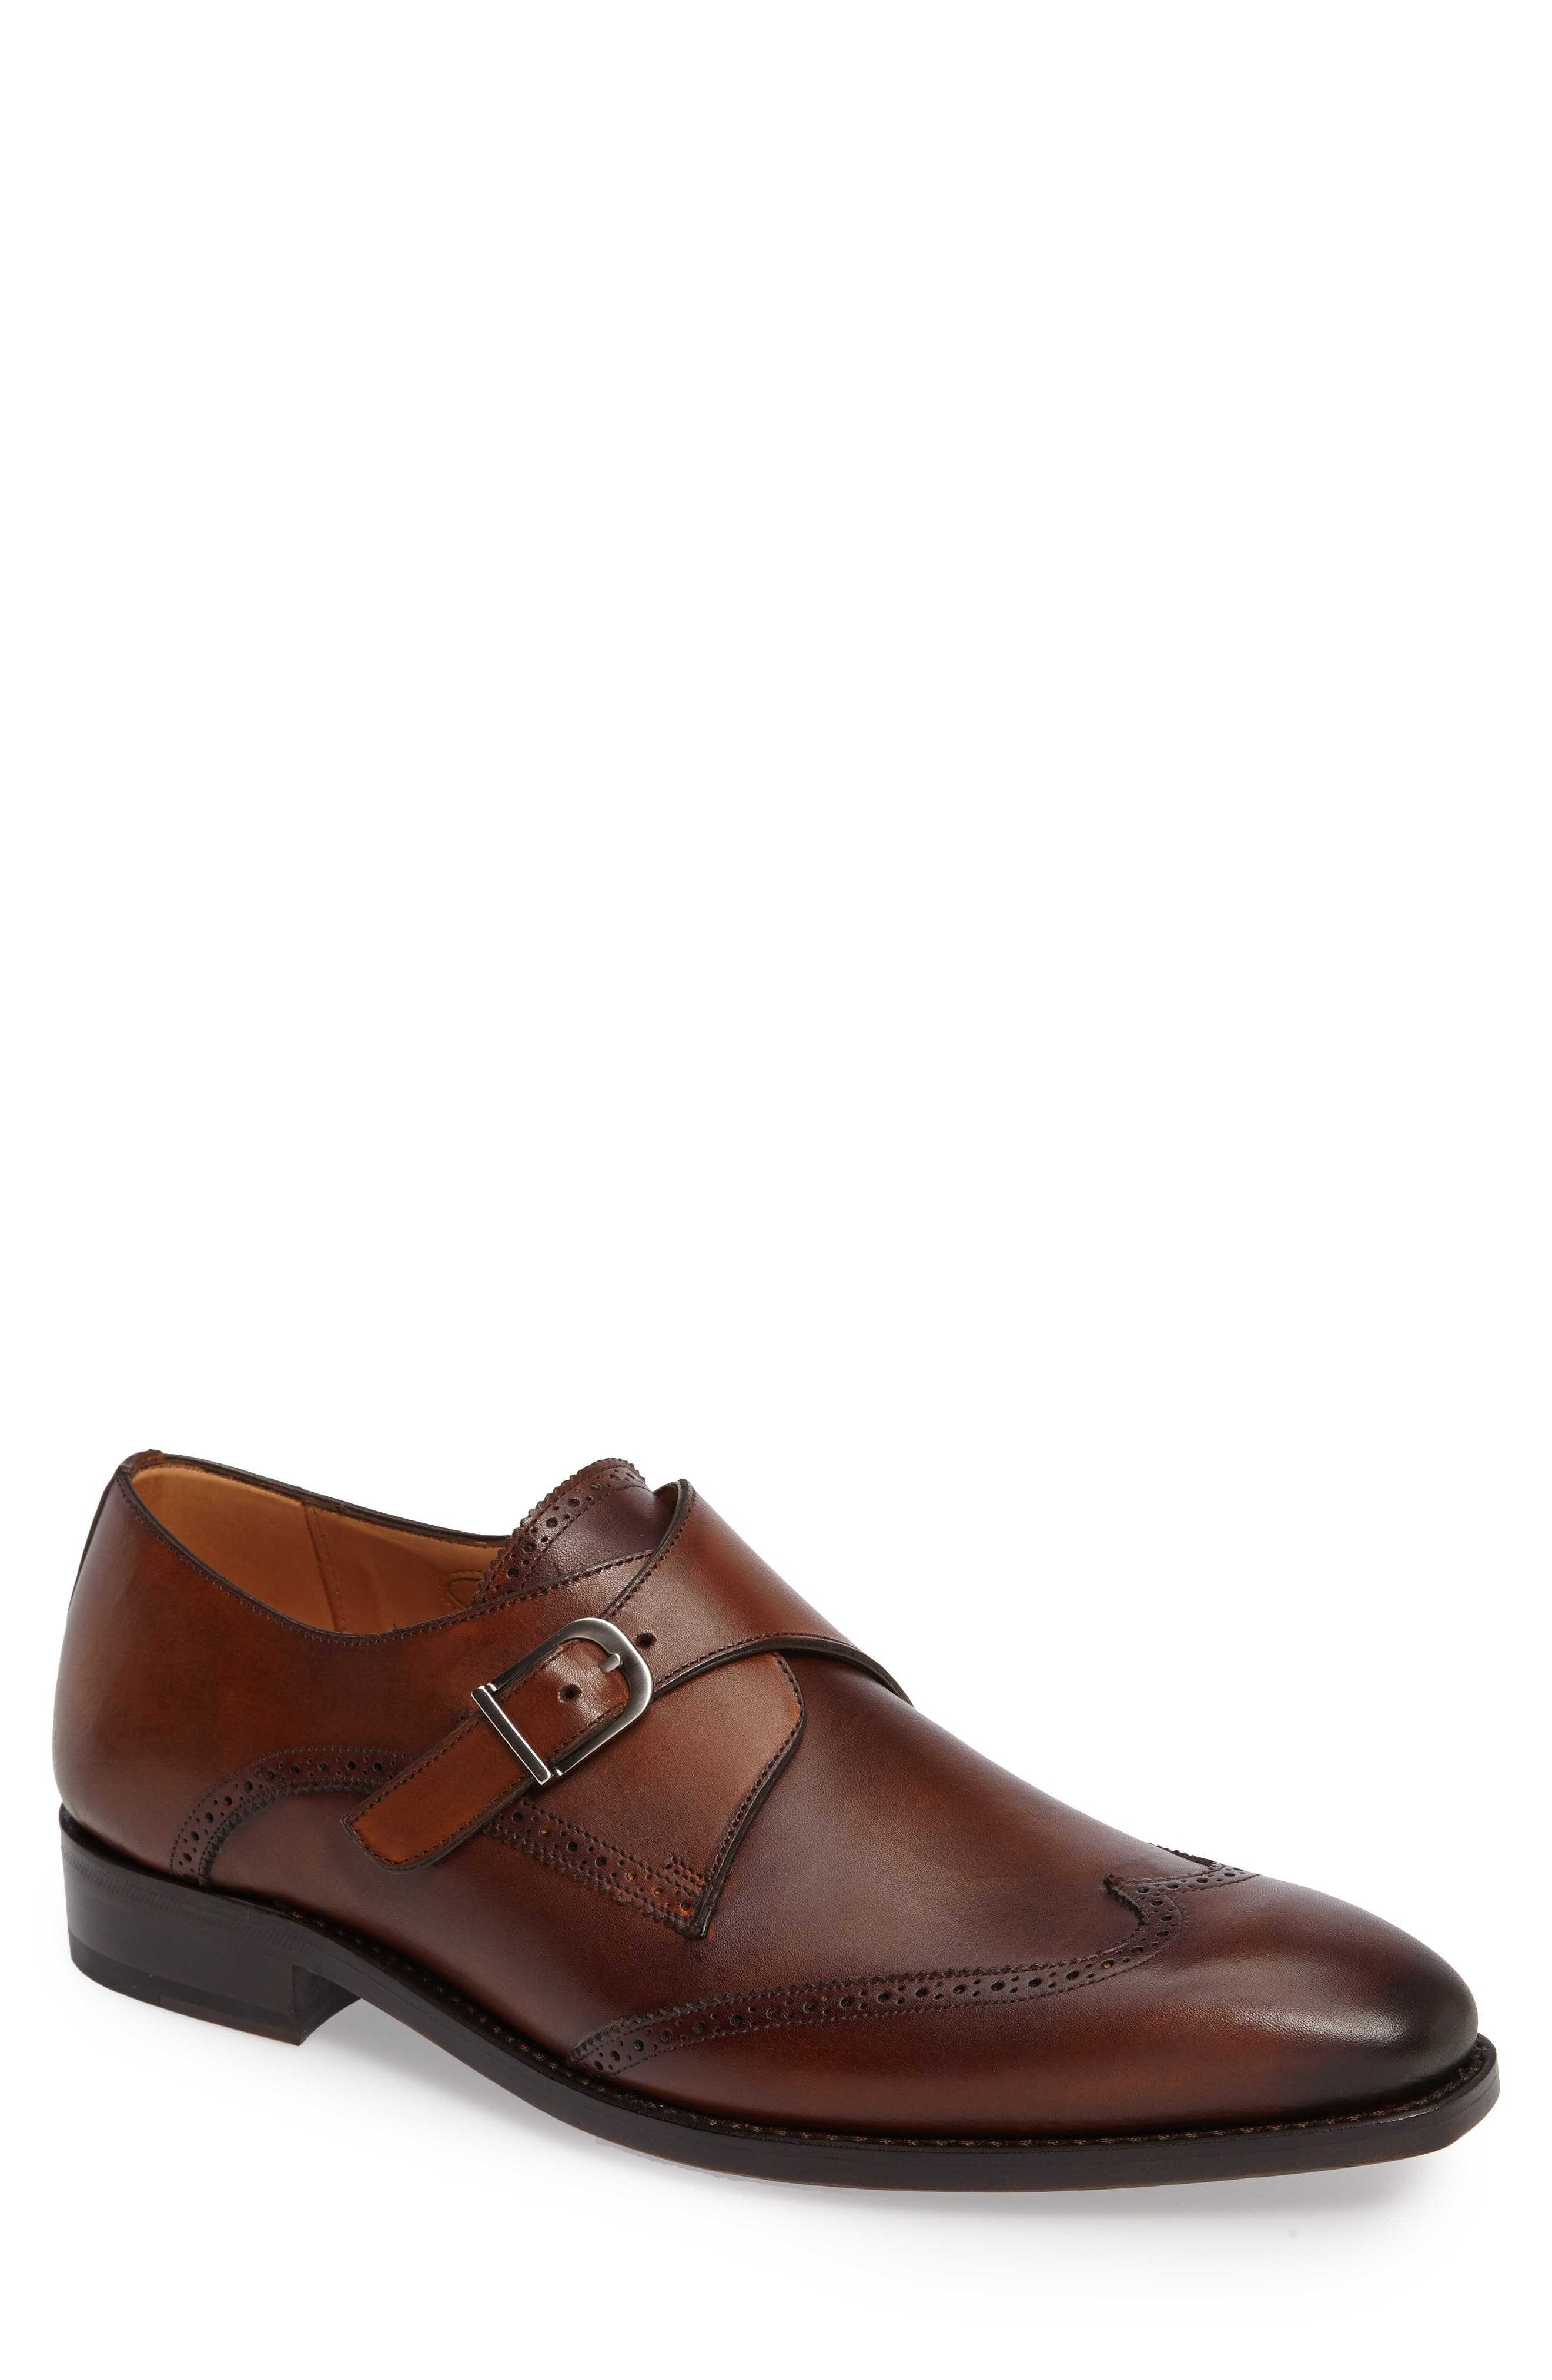 IMPRONTA by Mezlan G121 Wingtip Monk Strap Shoe